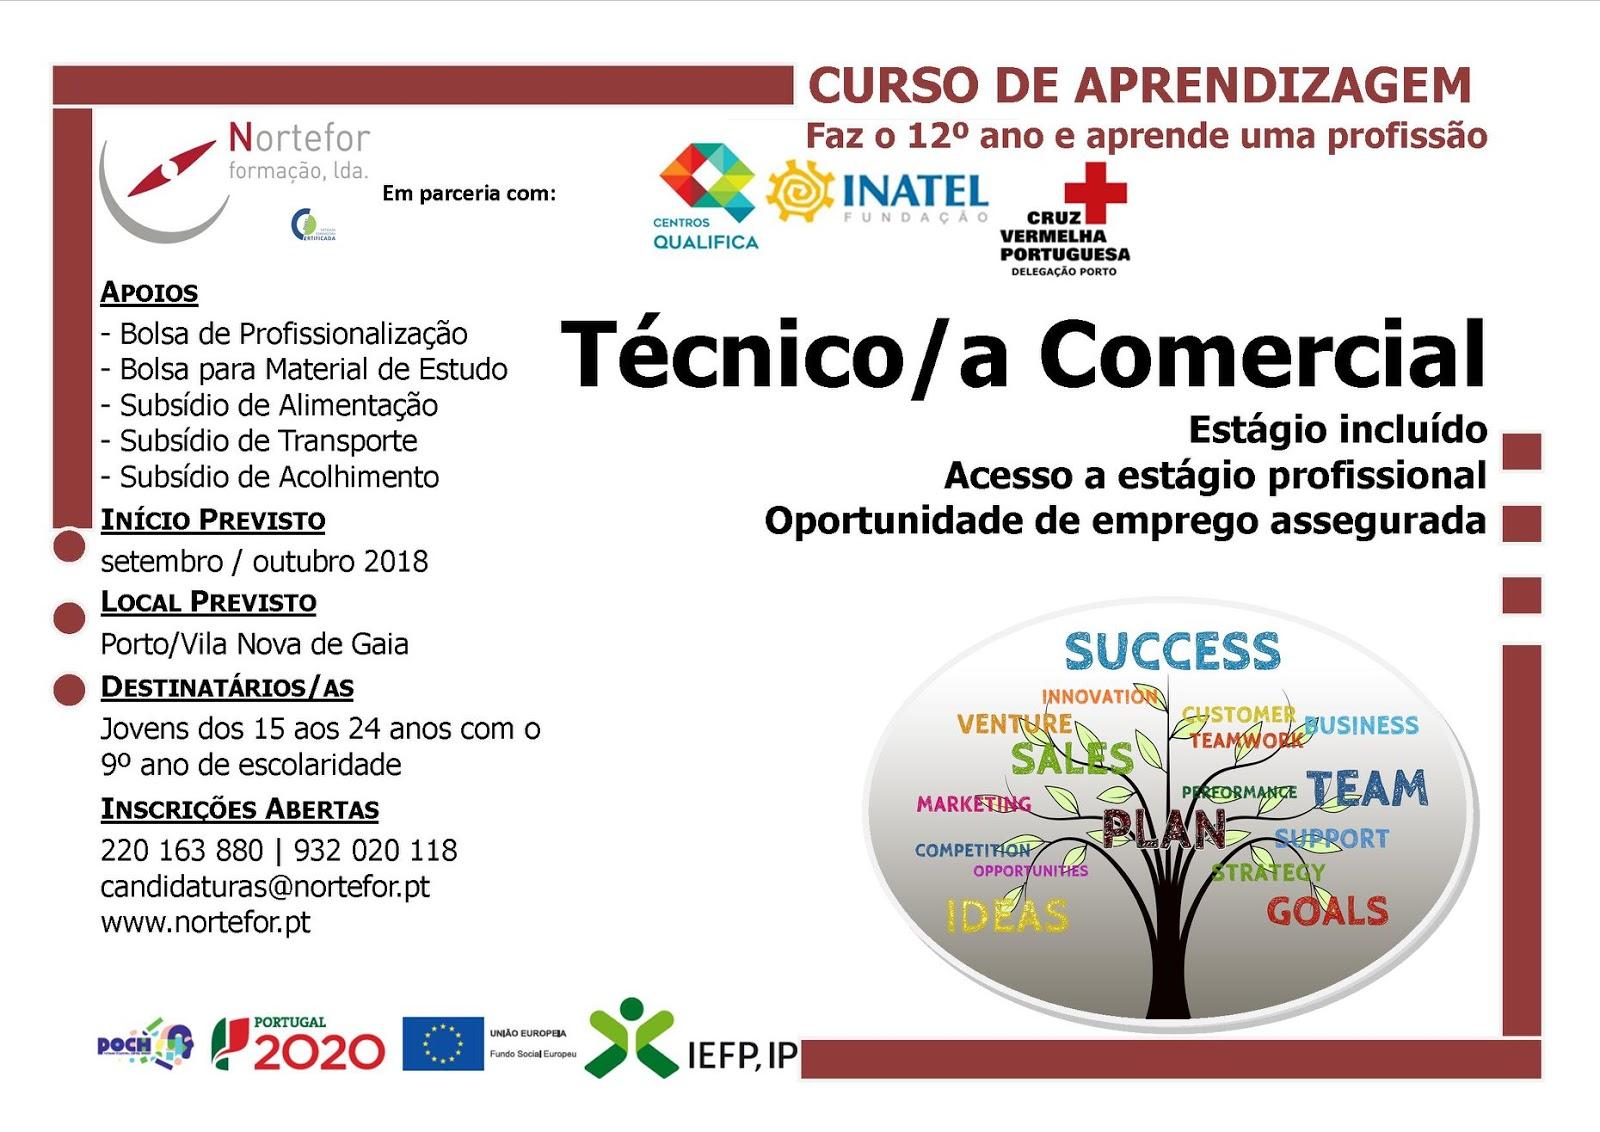 Curso financiado de técnico comercial no Porto